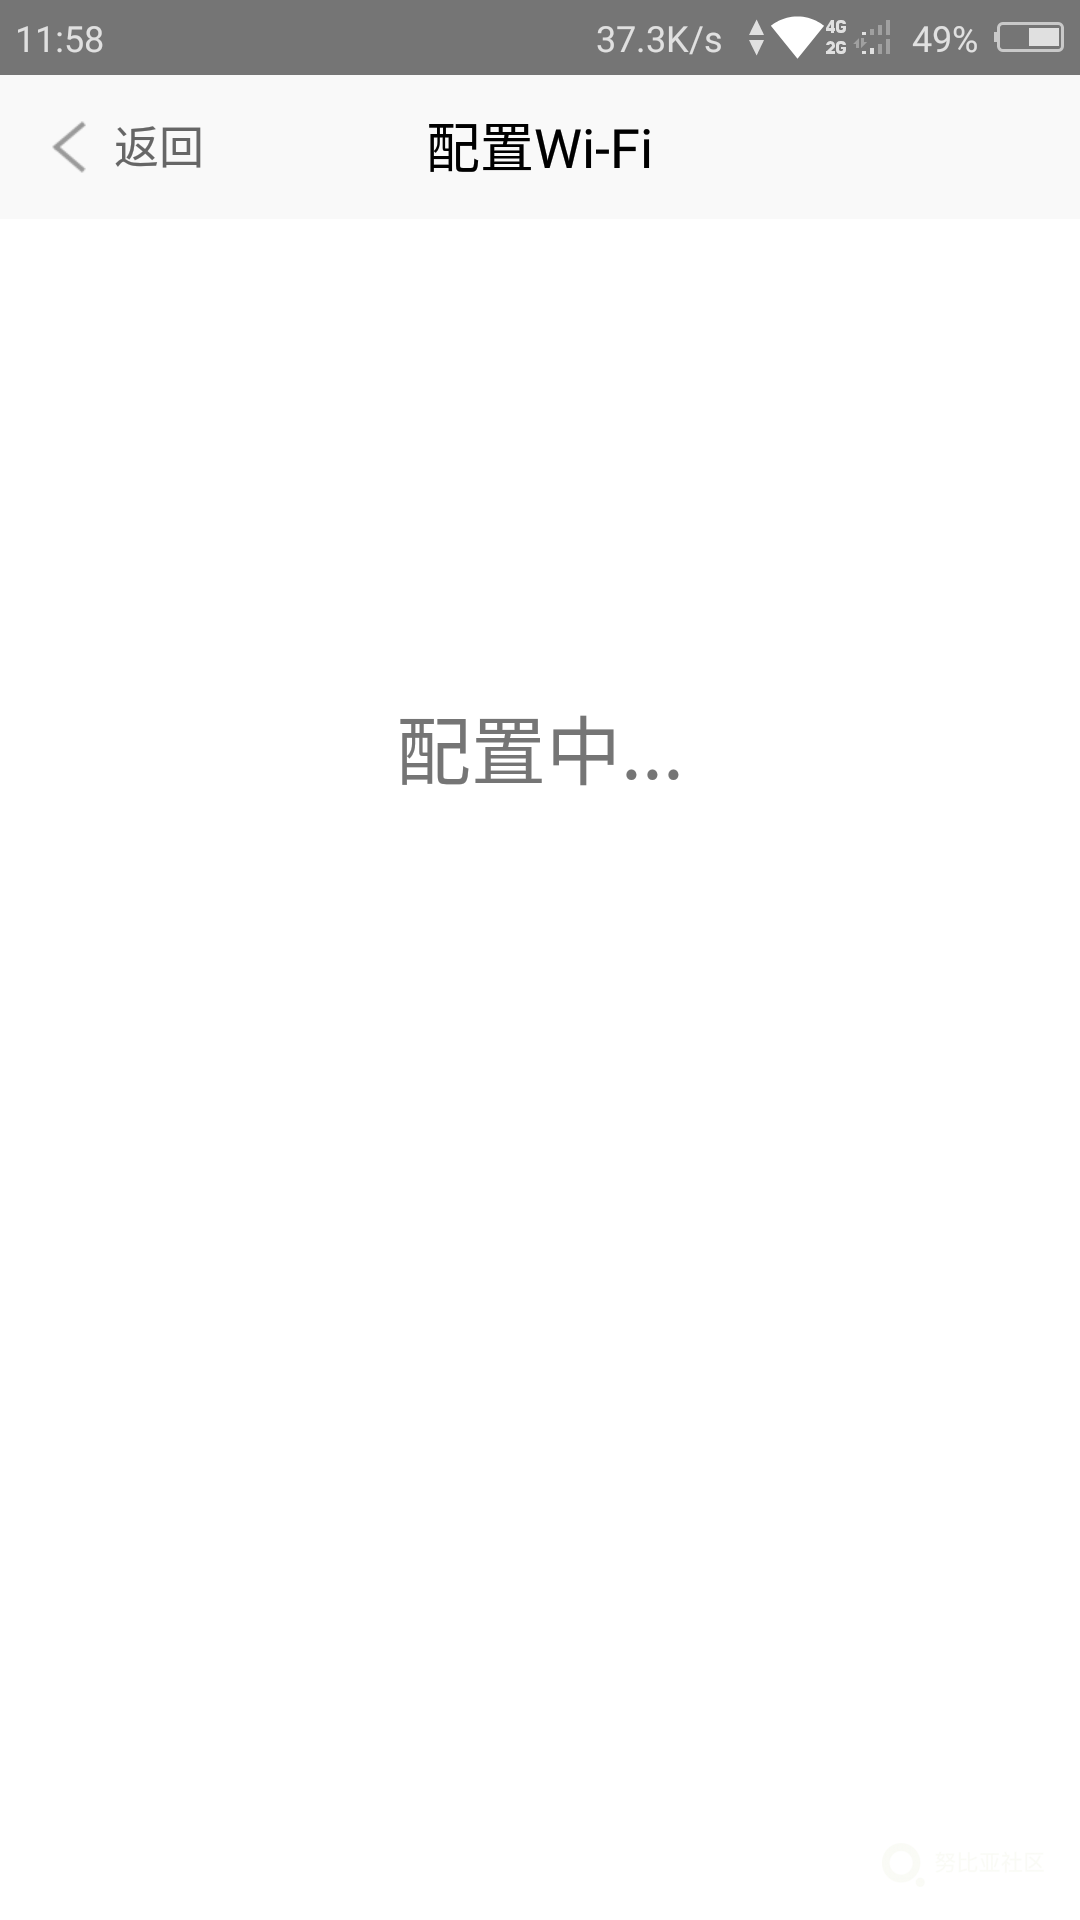 Screenshot_2018-01-31-11-58-28.png